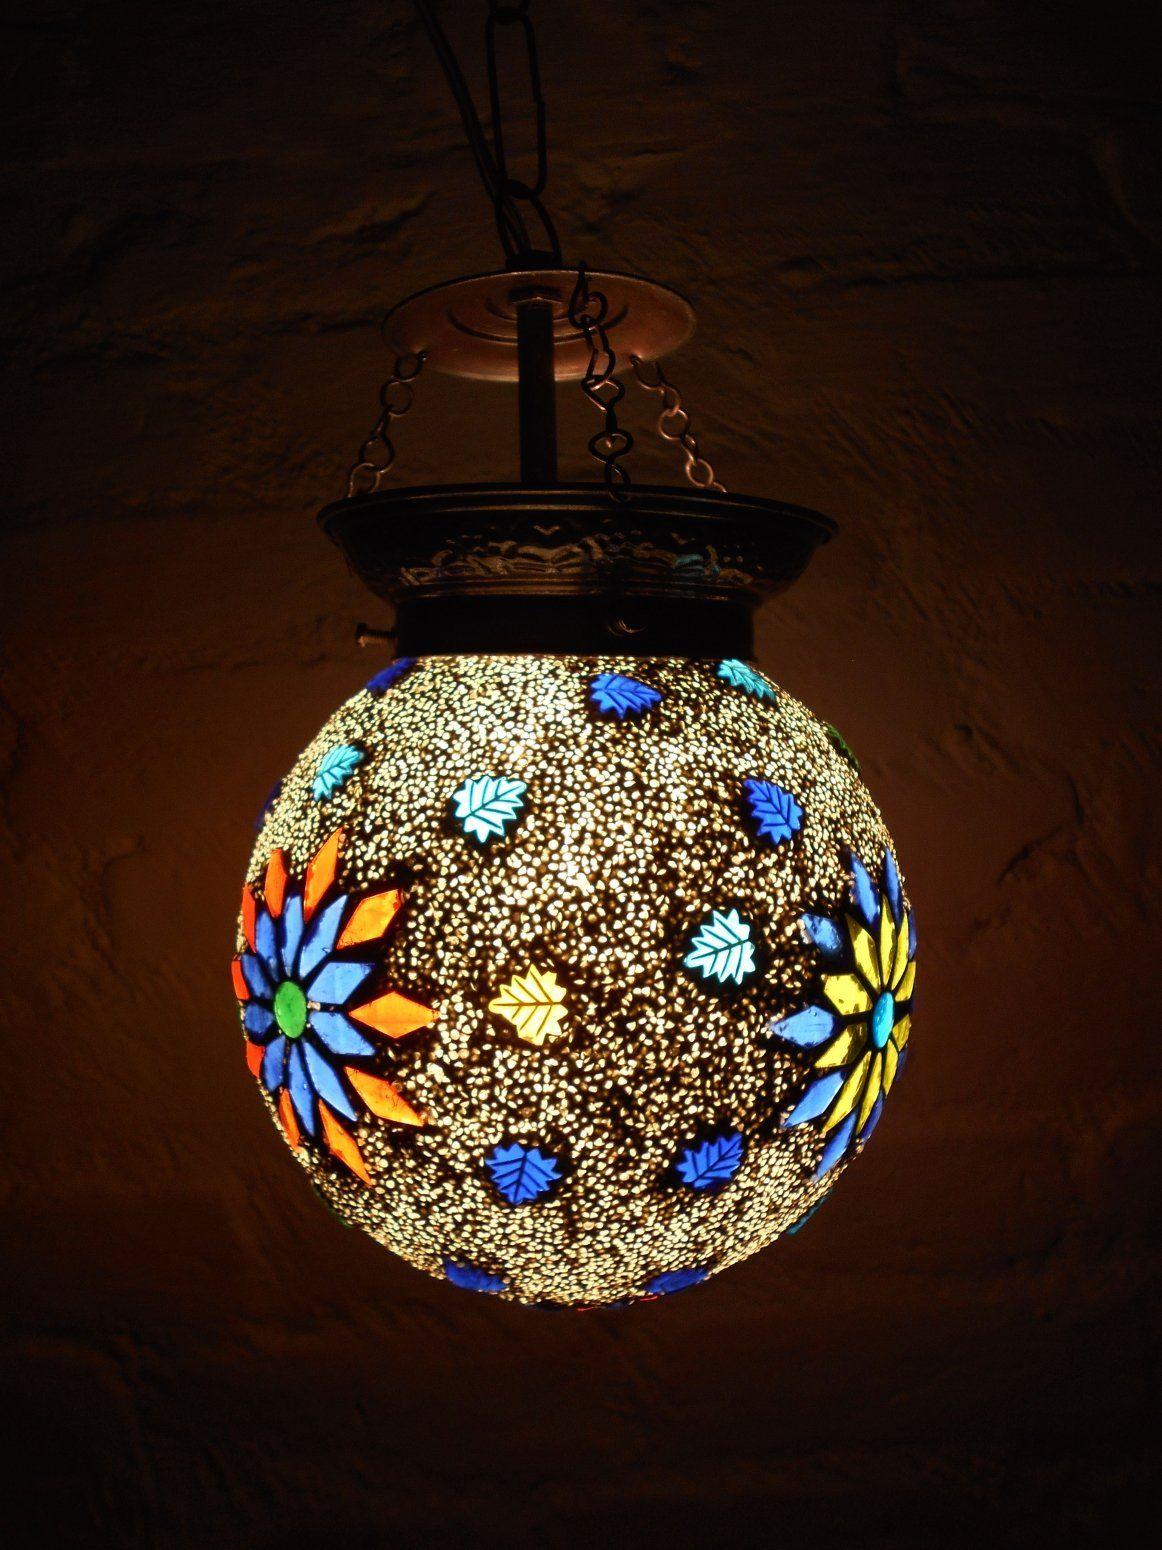 Susajjit Decor Artistic Mosaic Lamp Round Shape Hanging Lamp Shade